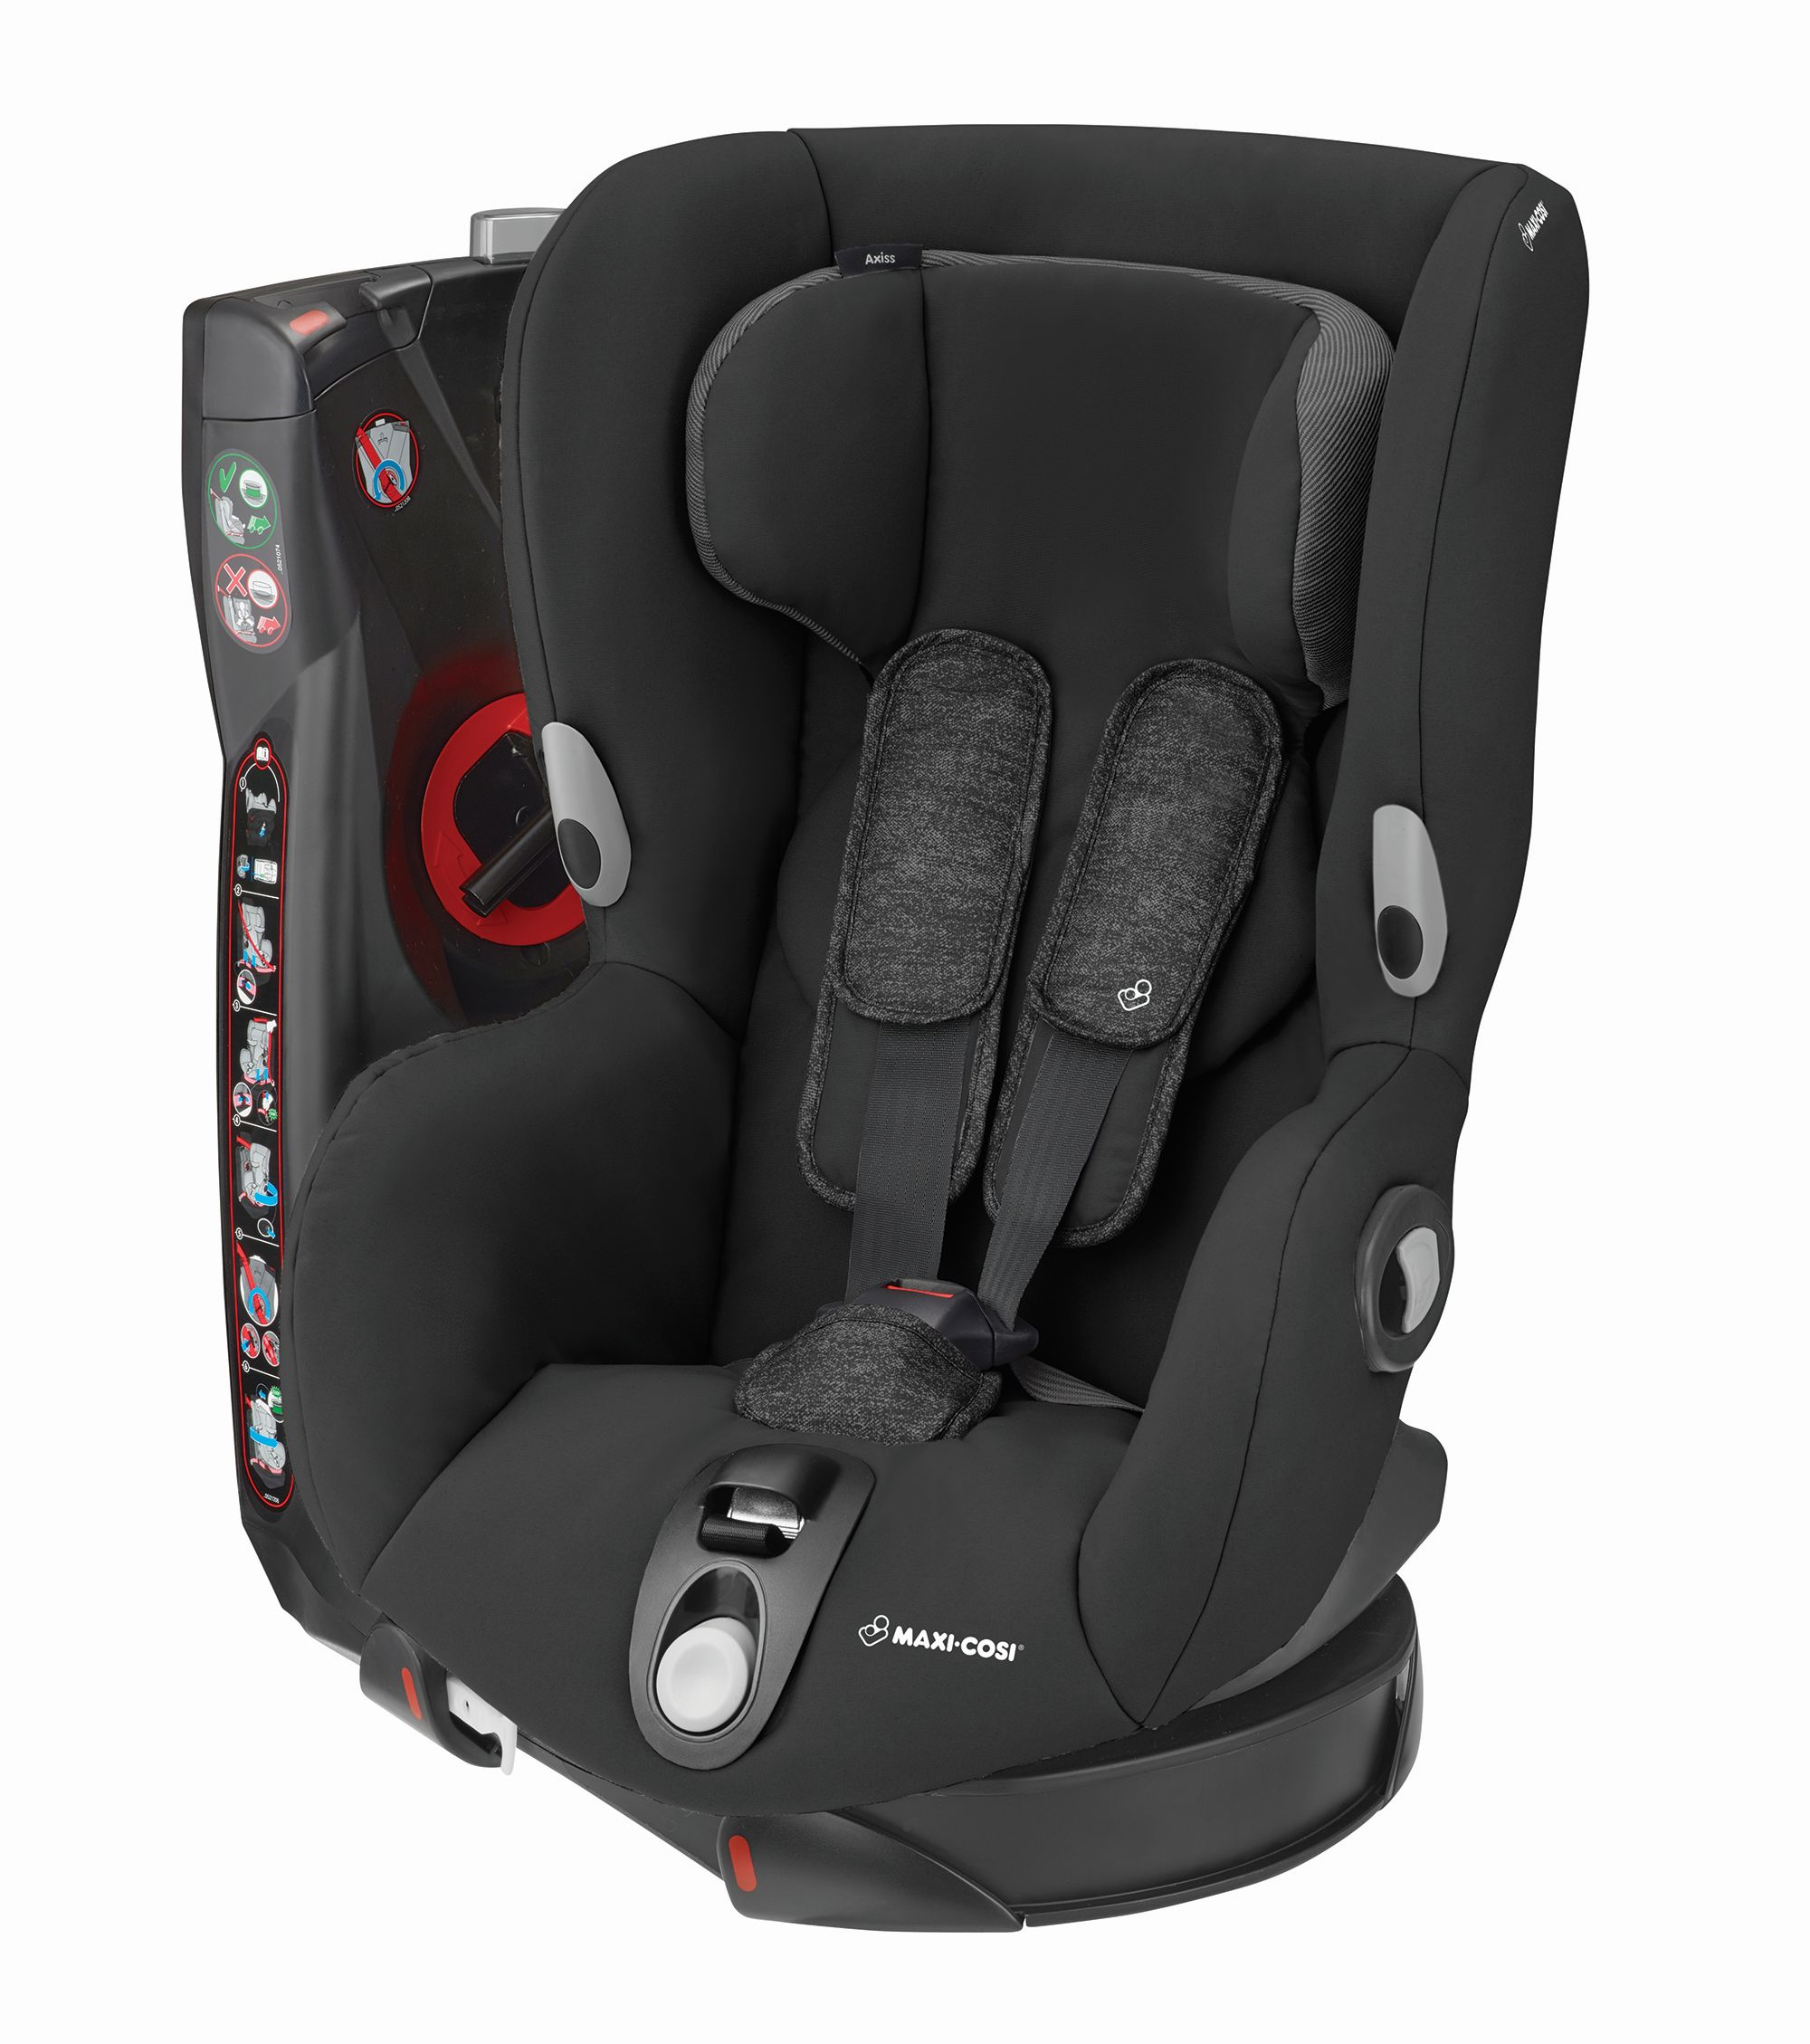 maxi cosi child car seat axiss 2019 nomad black buy at kidsroom car seats. Black Bedroom Furniture Sets. Home Design Ideas